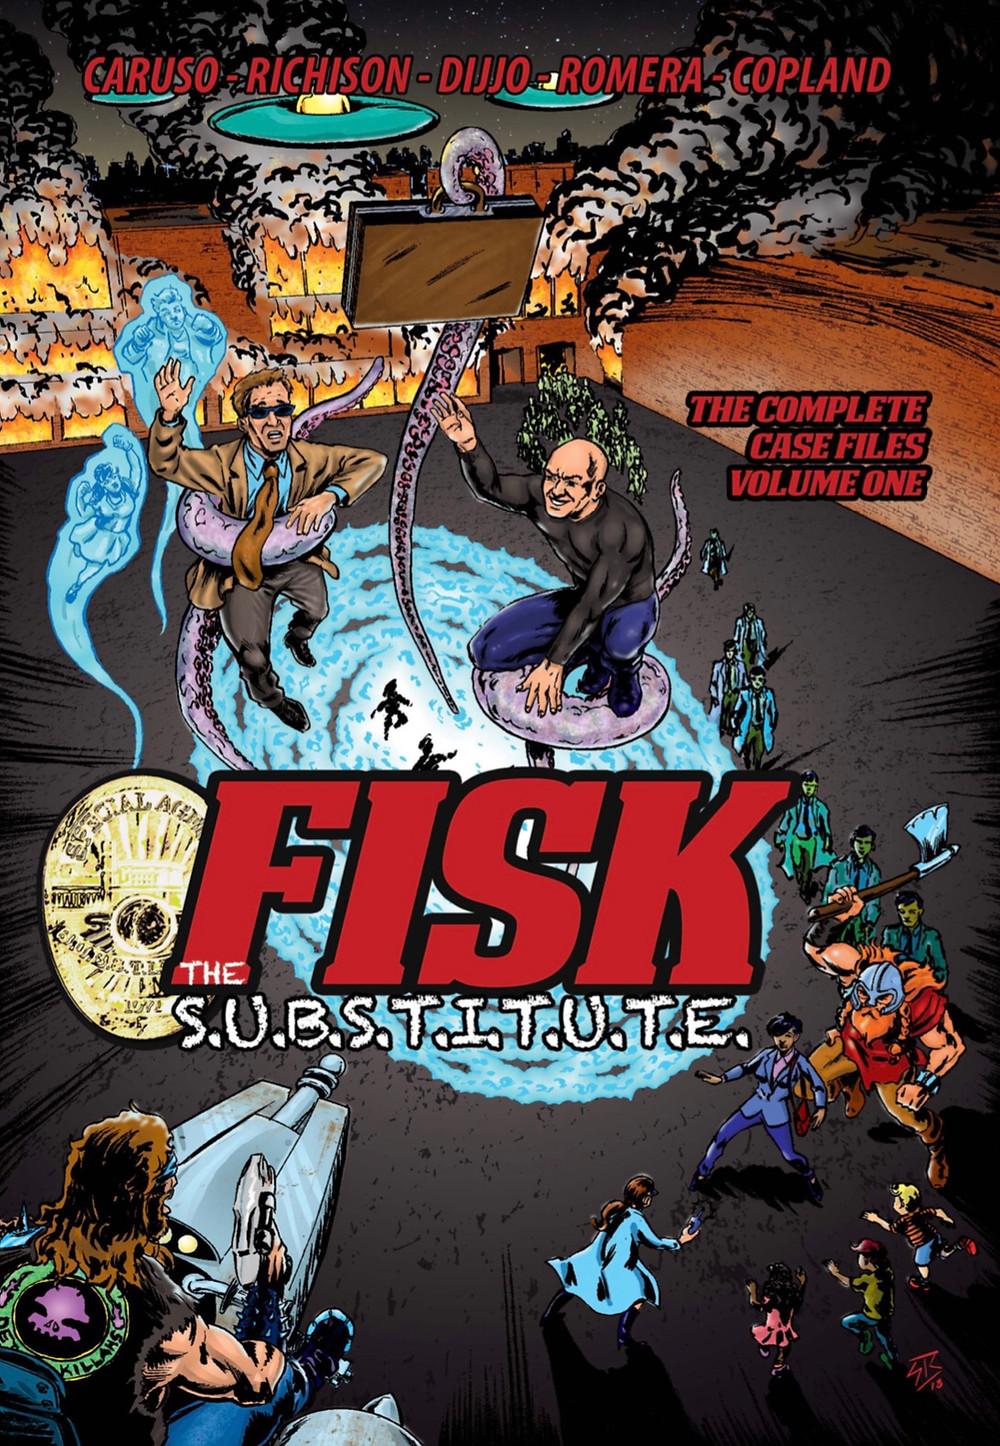 Fisk The S.U.B.S.T.I.T.U.T.E., Vol. 1 (tpb) cover, Self-published, Caruso/Richison